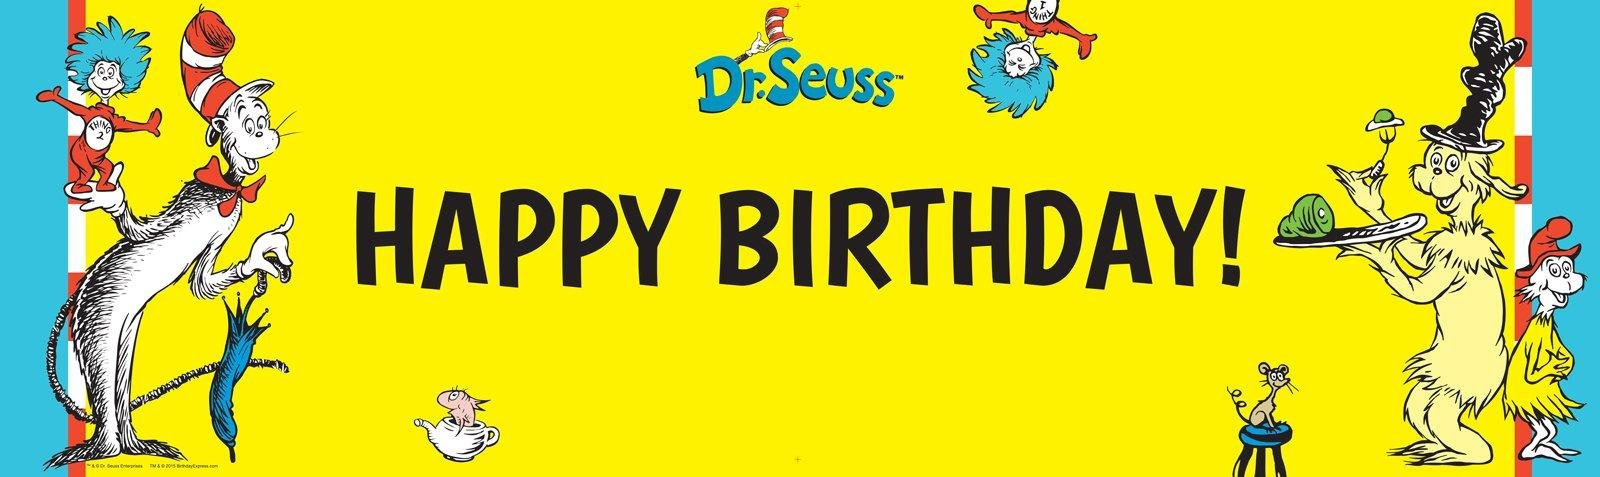 Dr. Seuss Birthday Banner